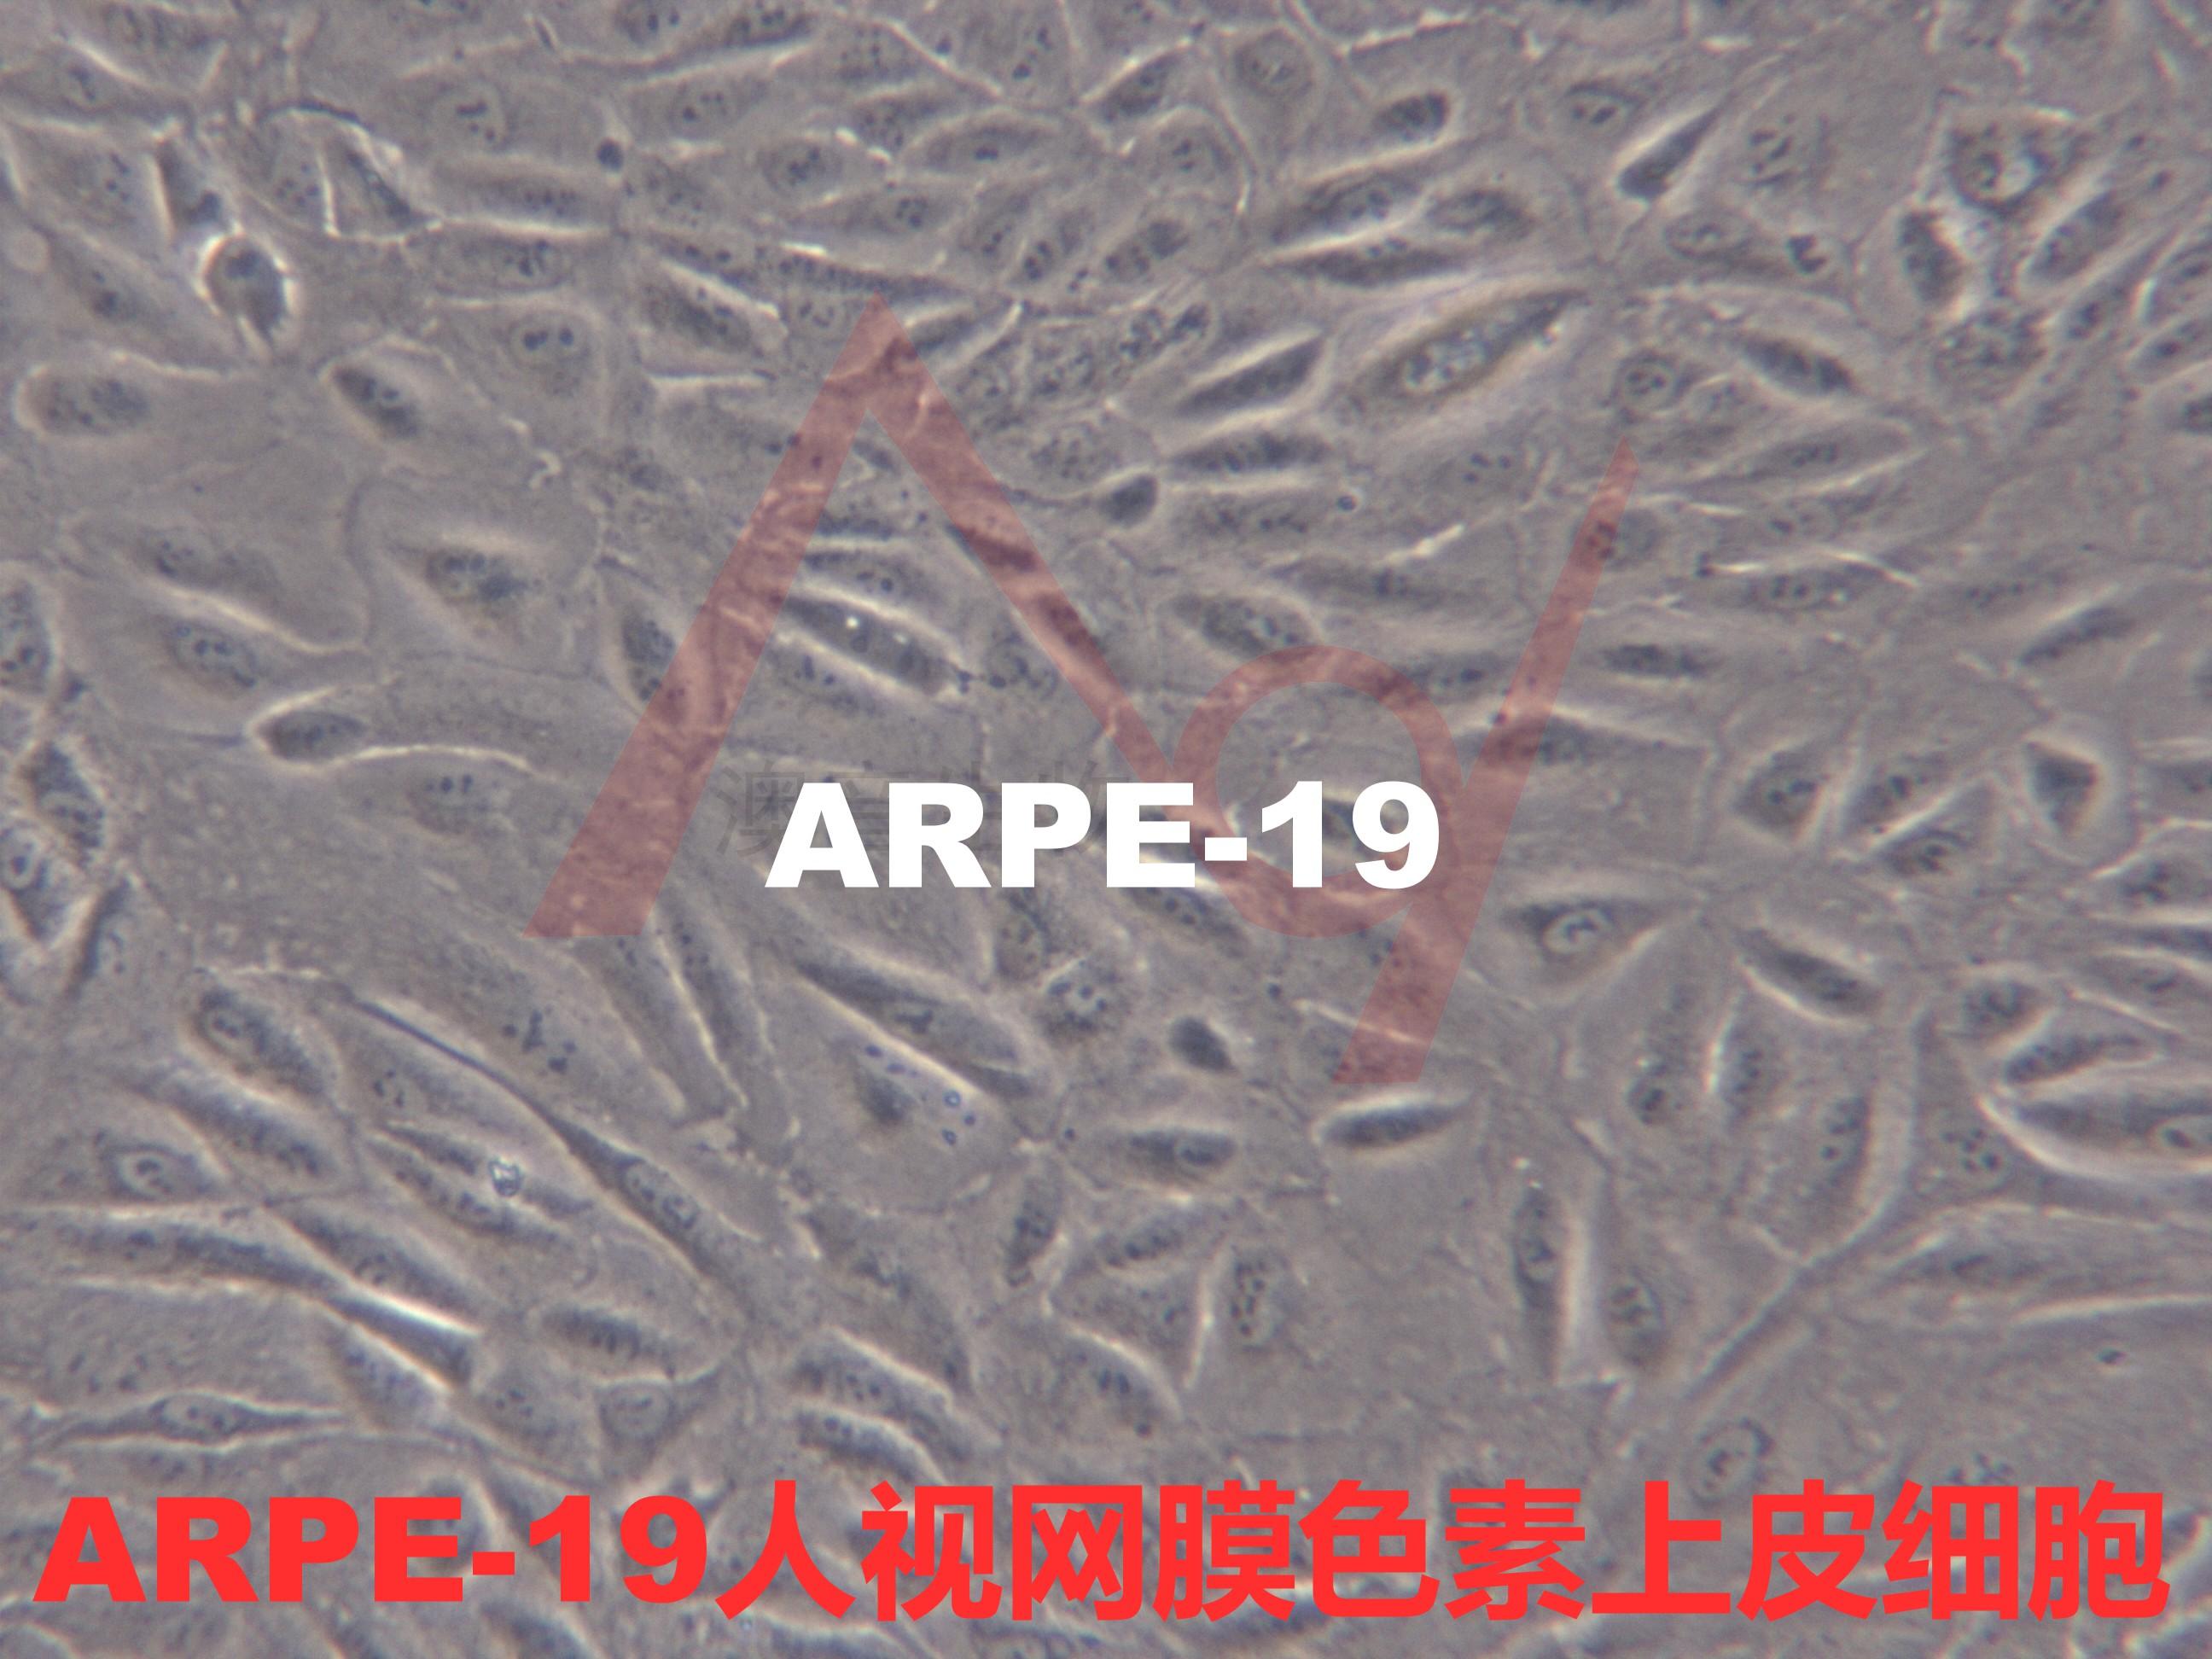 ARPE-19[ARPE19; Adult Retinal Pigment Epithelial cell line-19; NTC-200; NTC200]人视网膜色素上皮细胞